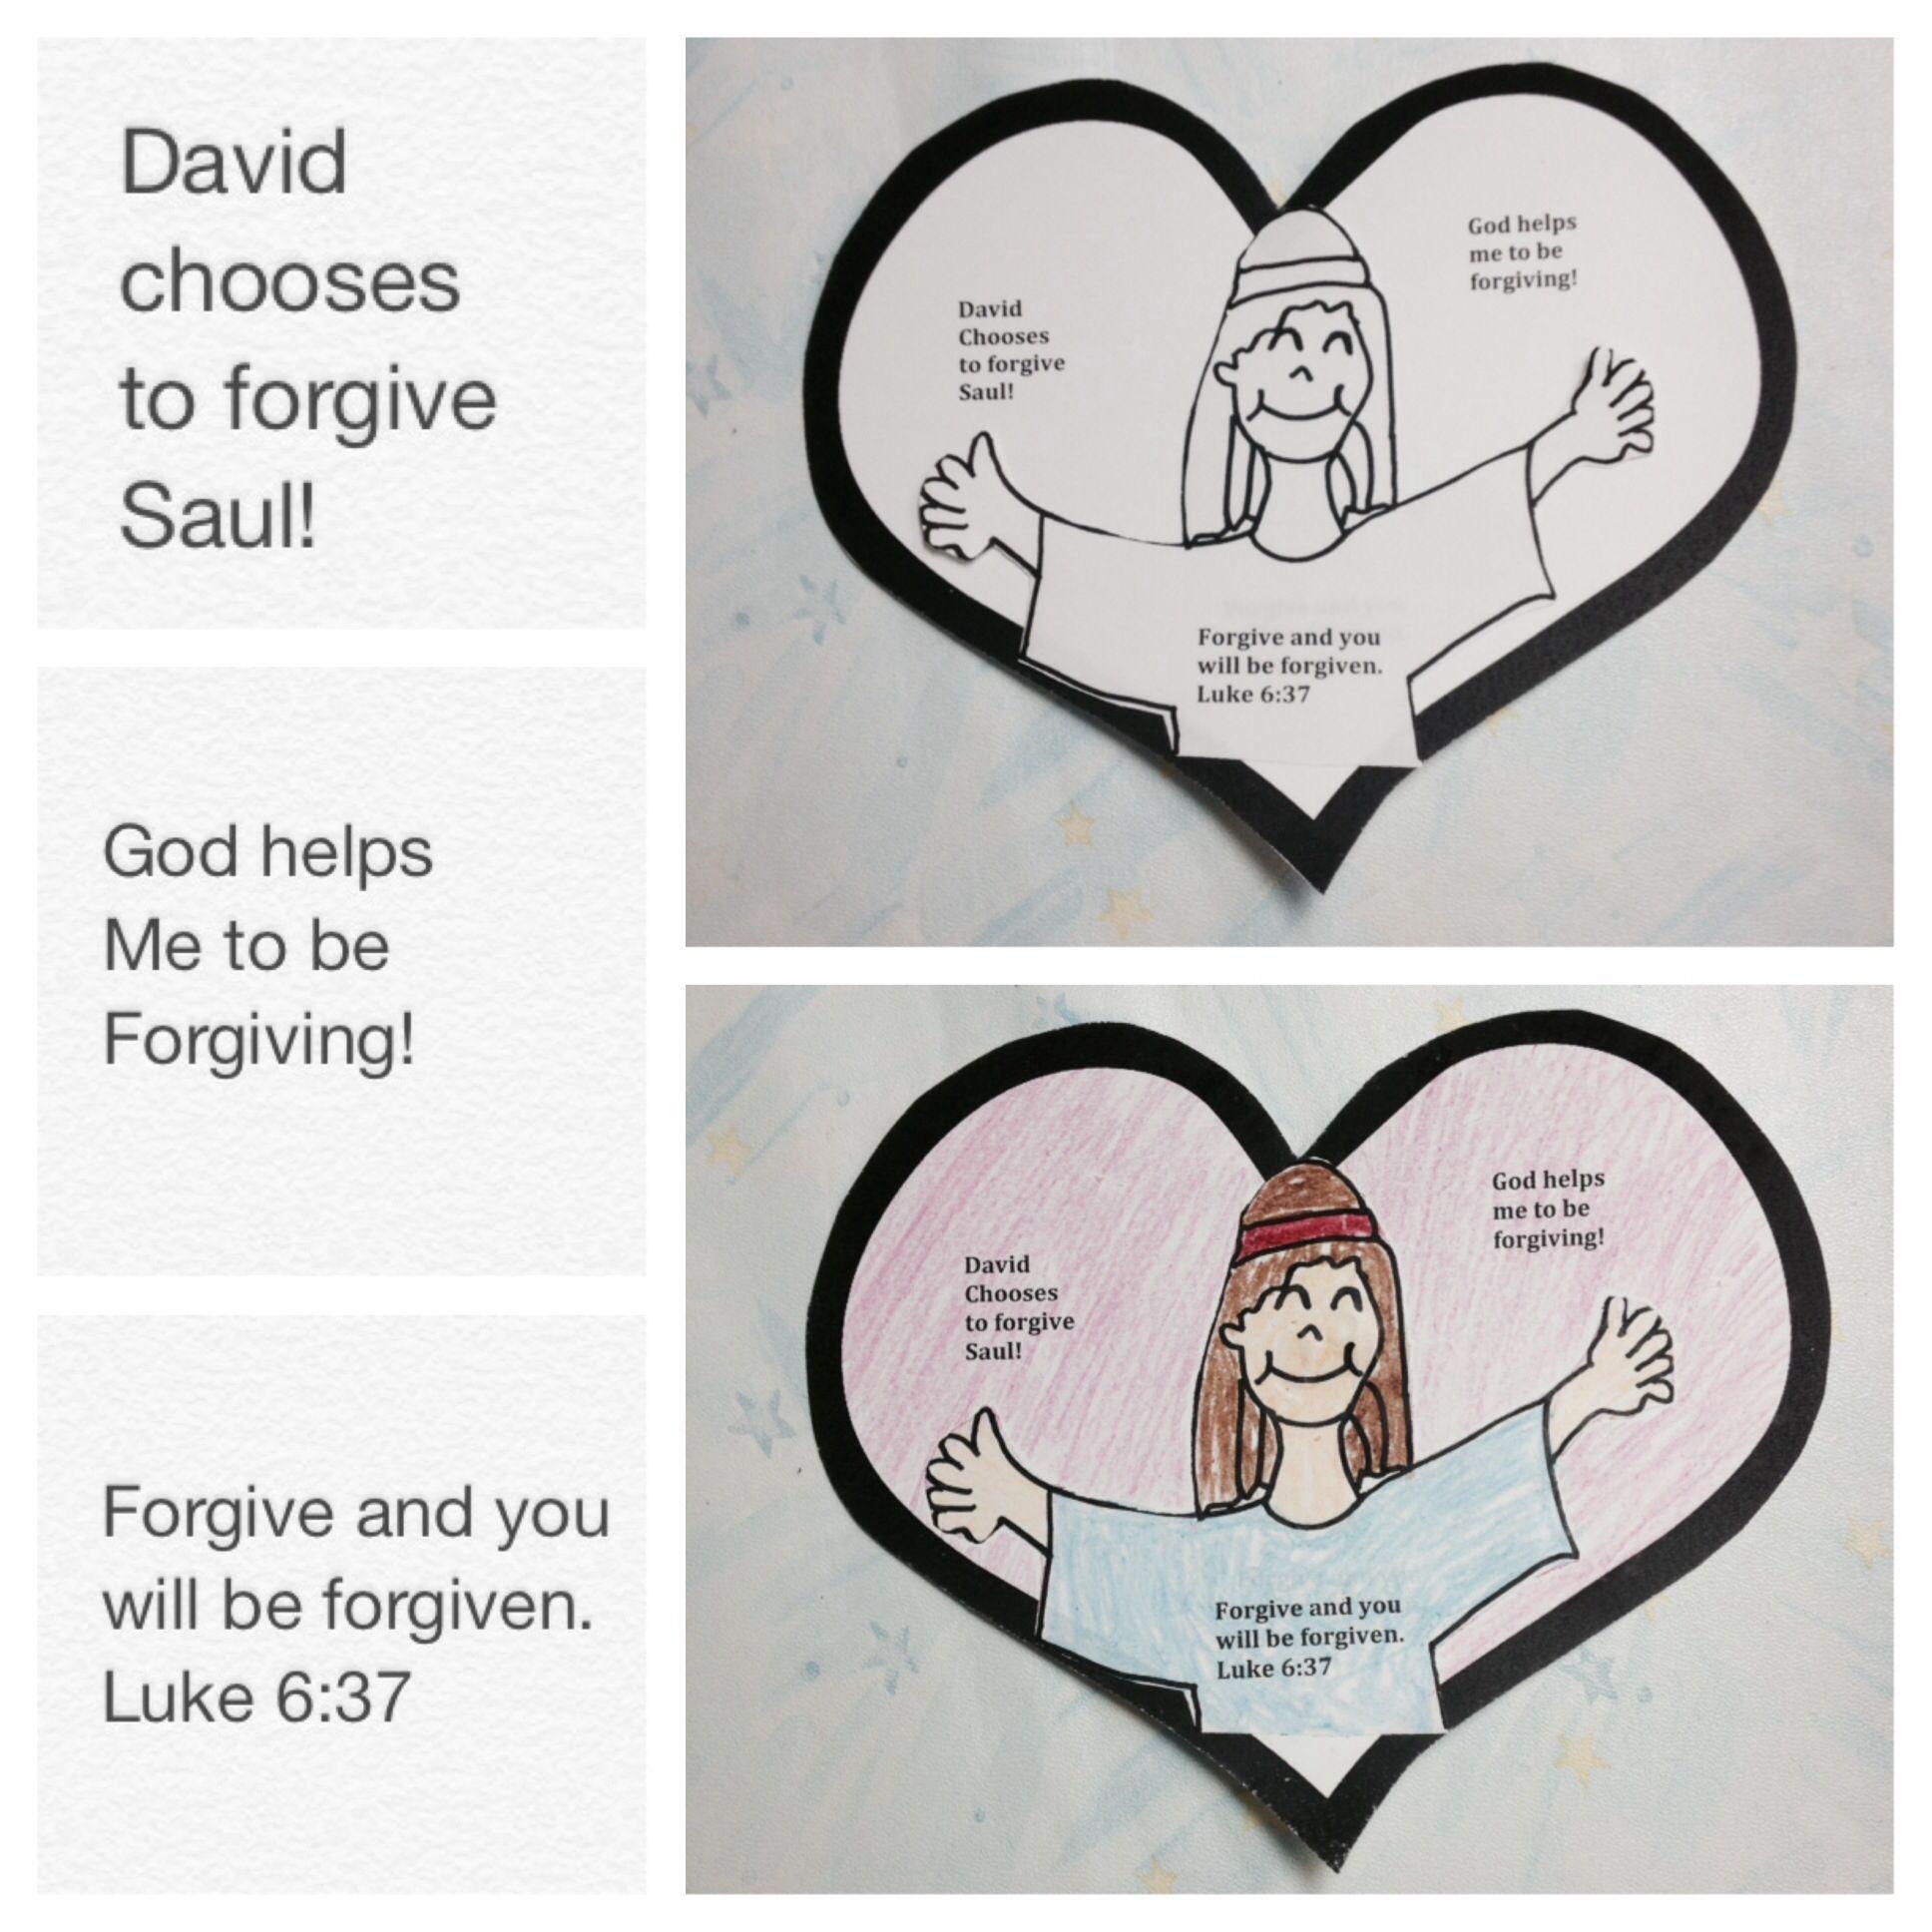 Bible Gateway passage: 1 Samuel 31 - The Message